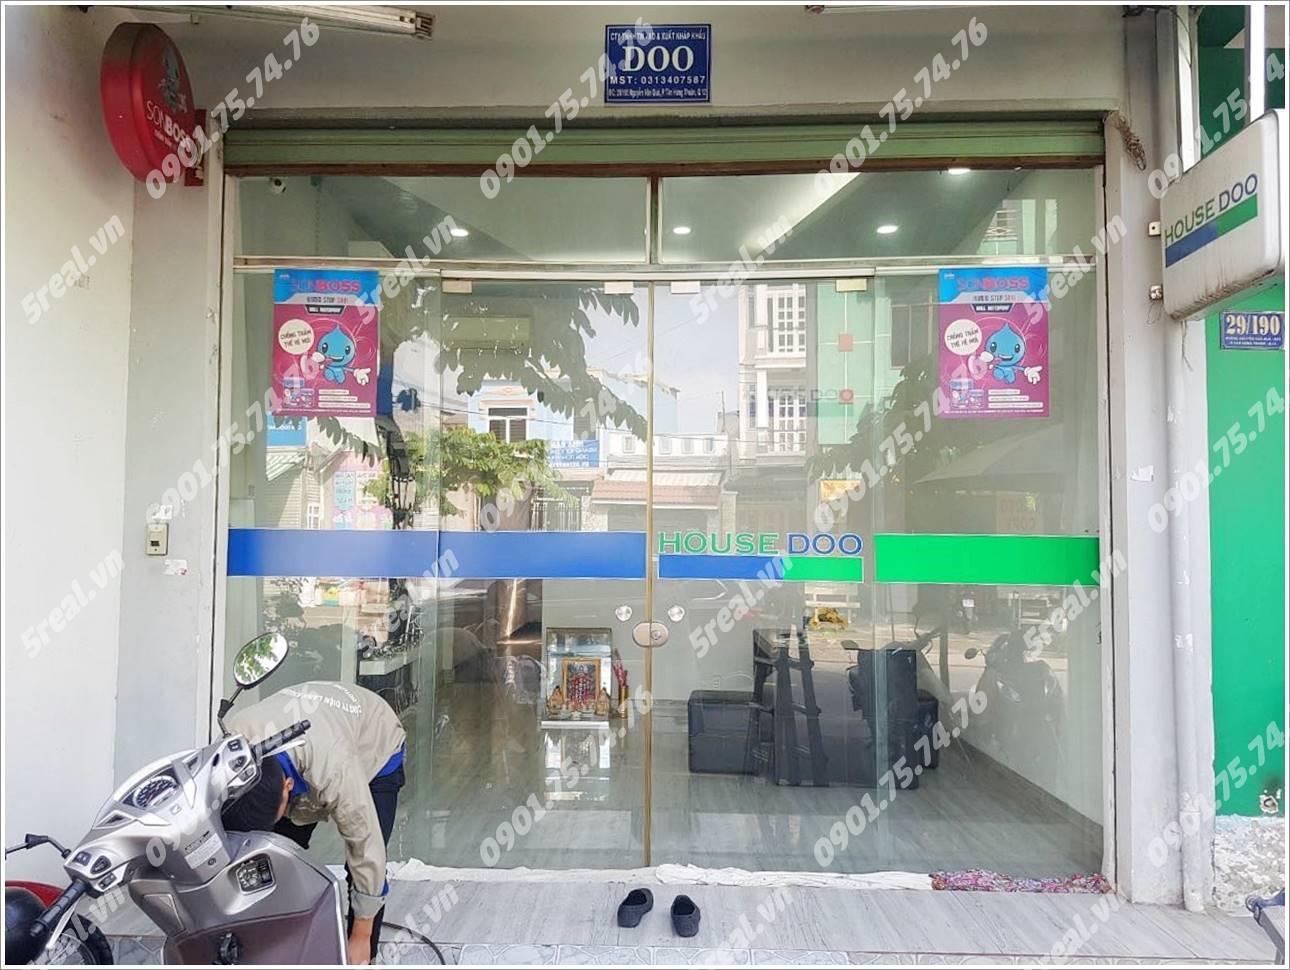 doo-building-nguyen-van-qua-quan-12-van-phong-cho-thue-5real.vn-01